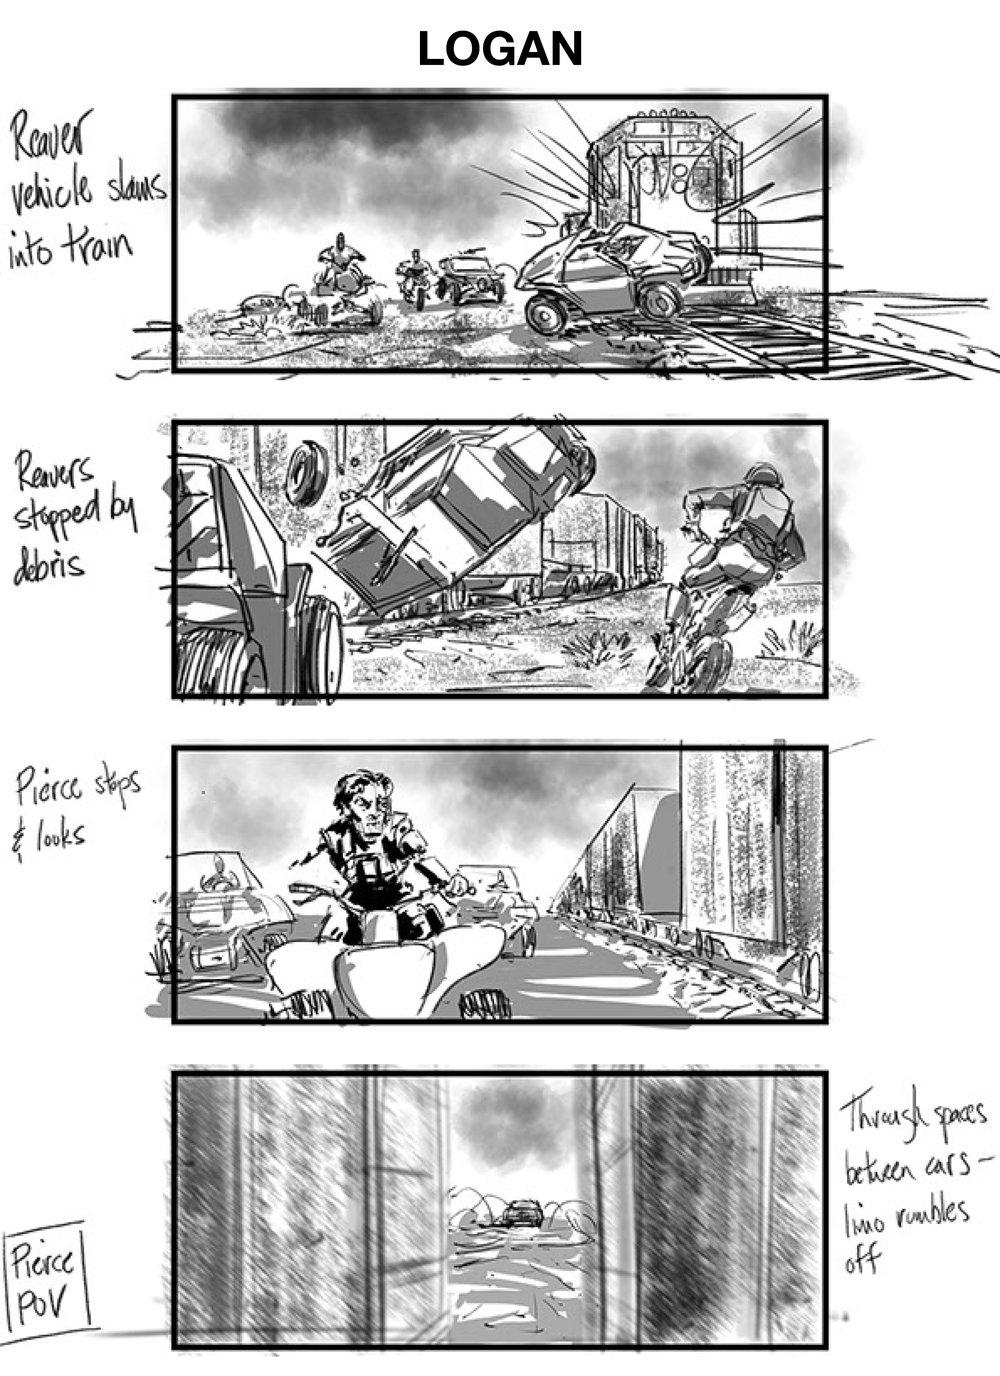 Logan web-11.jpg